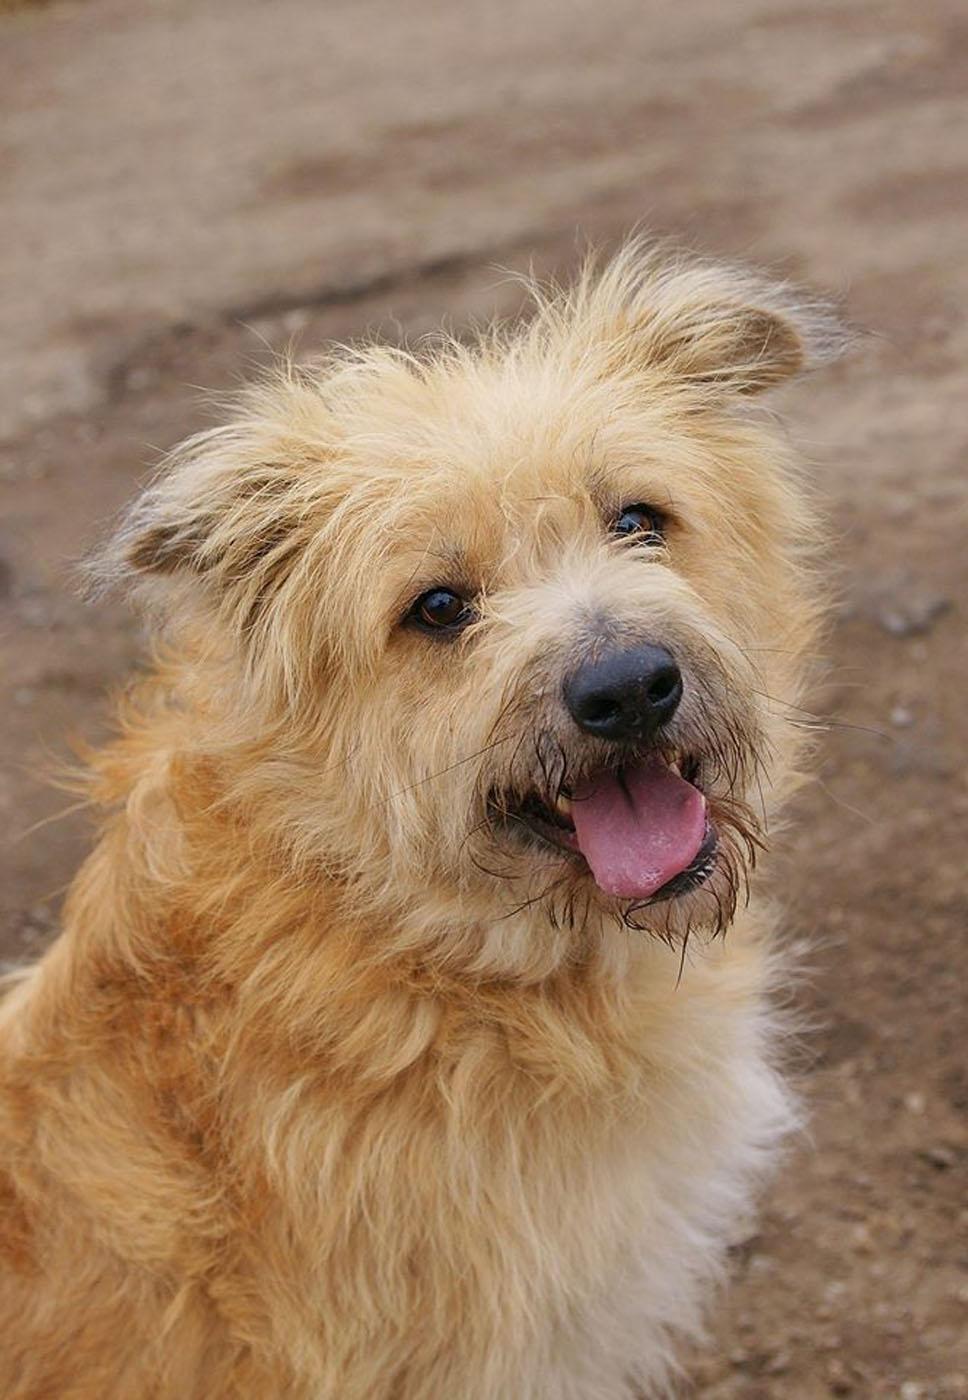 собака Апельсин из приюта догпорт